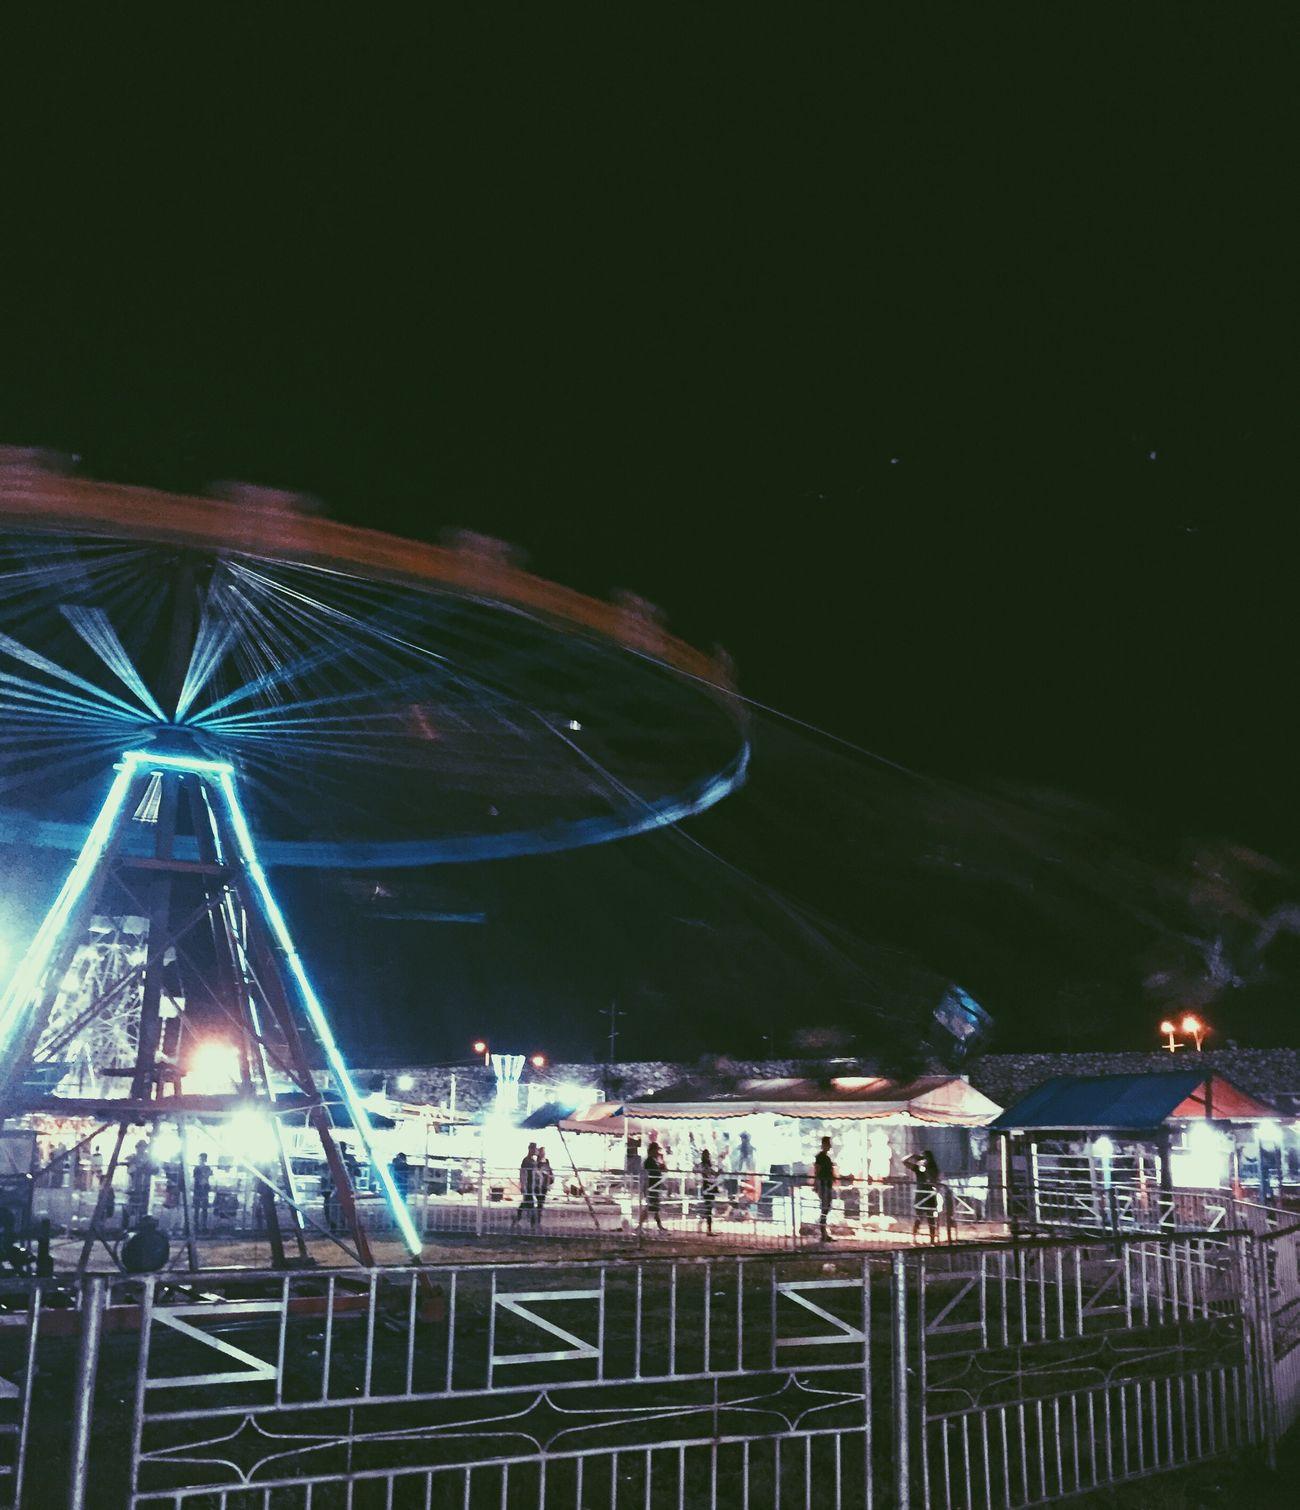 Theme Park Memory Lane Life Time Love Outdoors Night City Eyeemphoto Eyeem Philippines Cebu